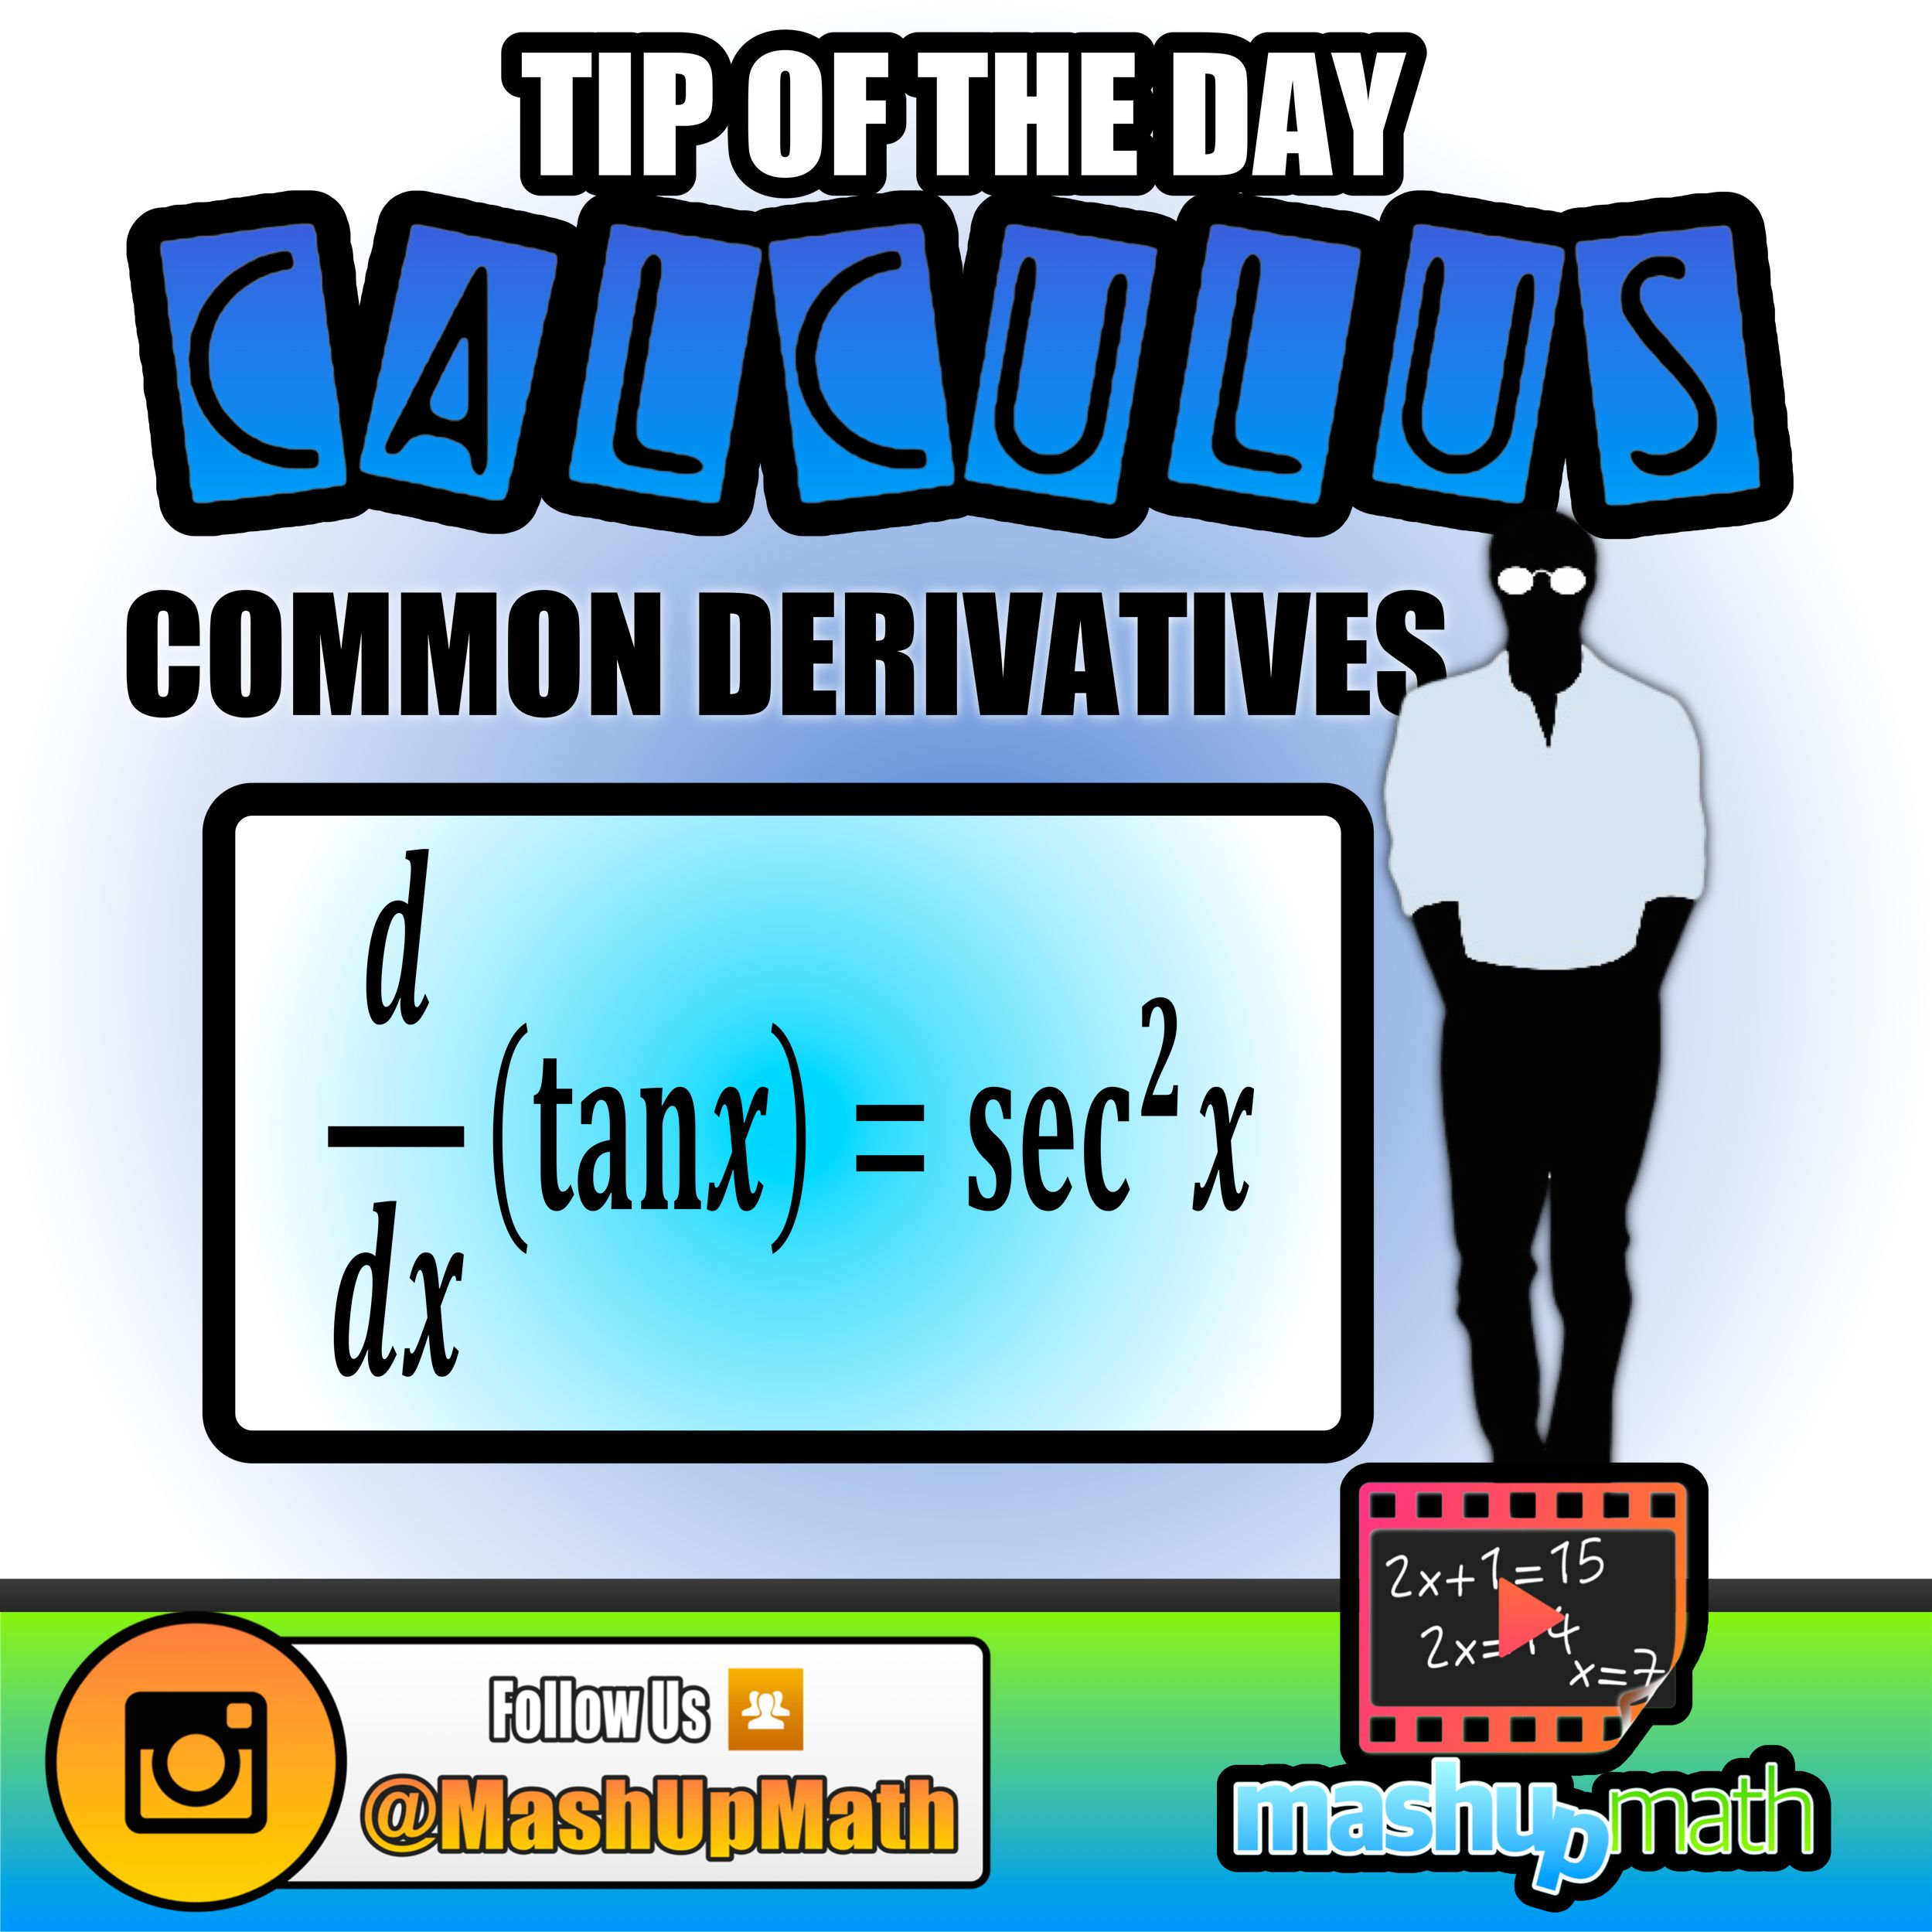 Follow Mashupmath On Instagram For Daily Math Tips